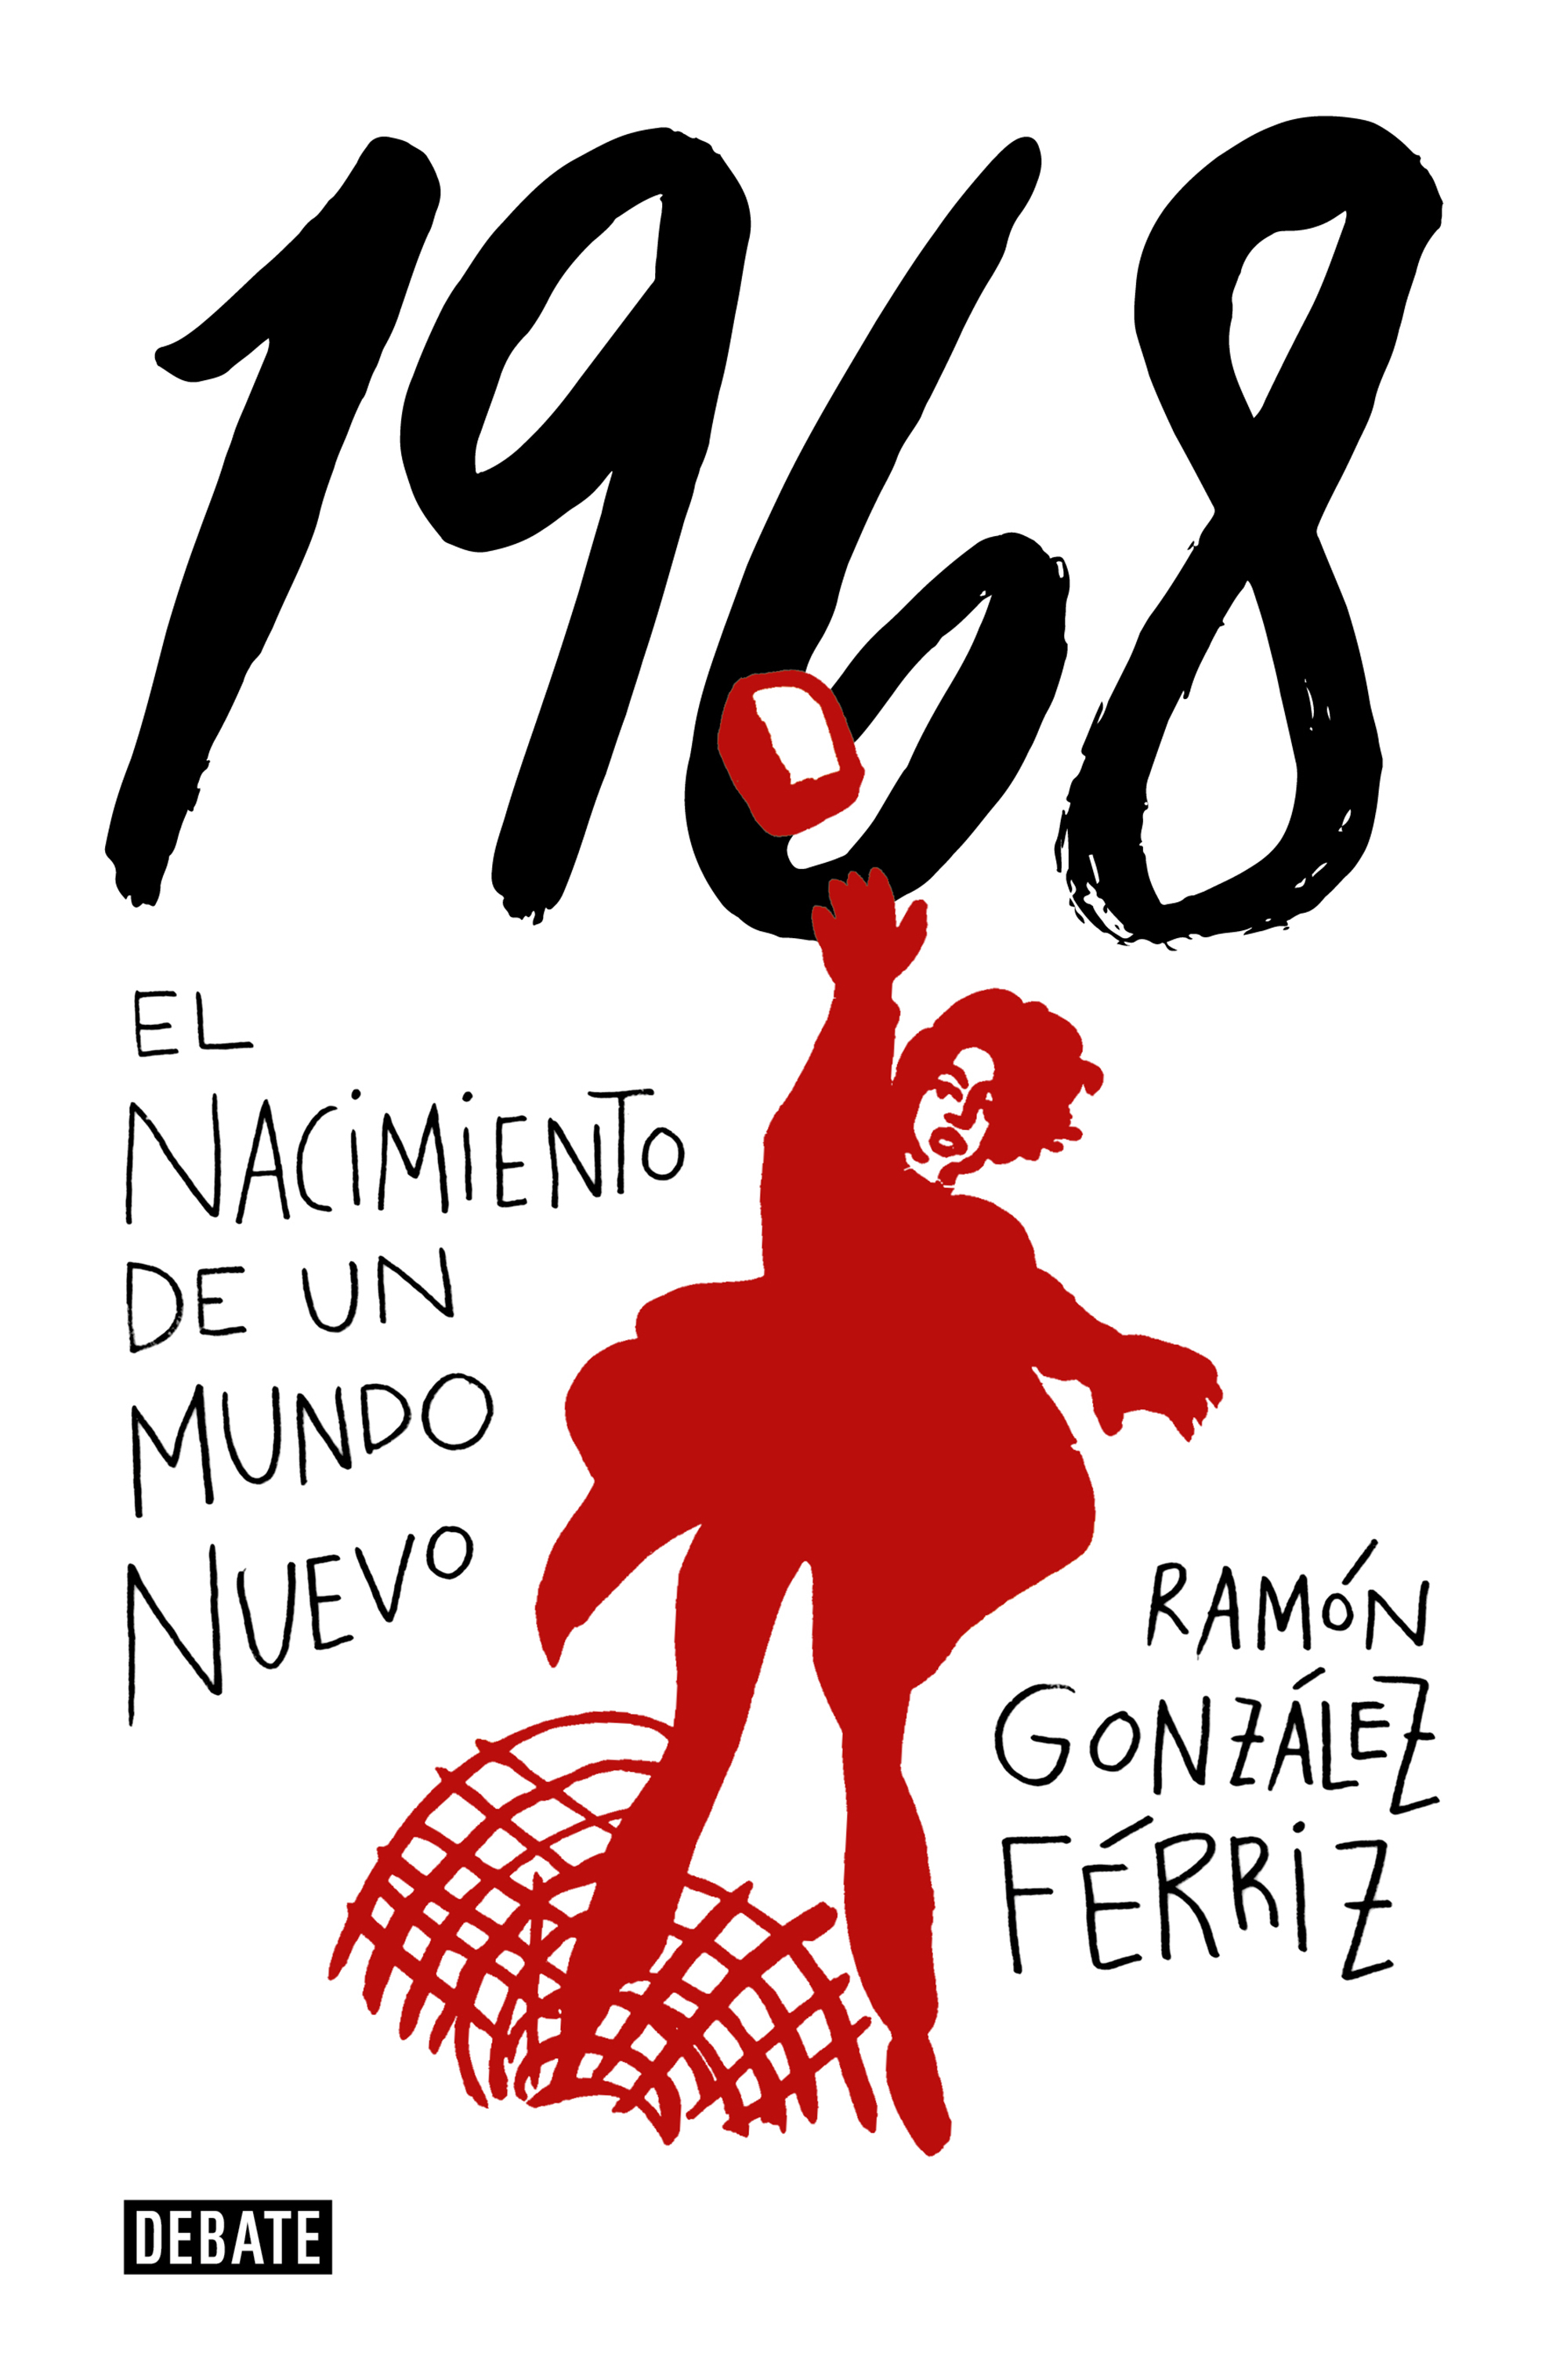 1968_ramon_gonzalez_ferriz